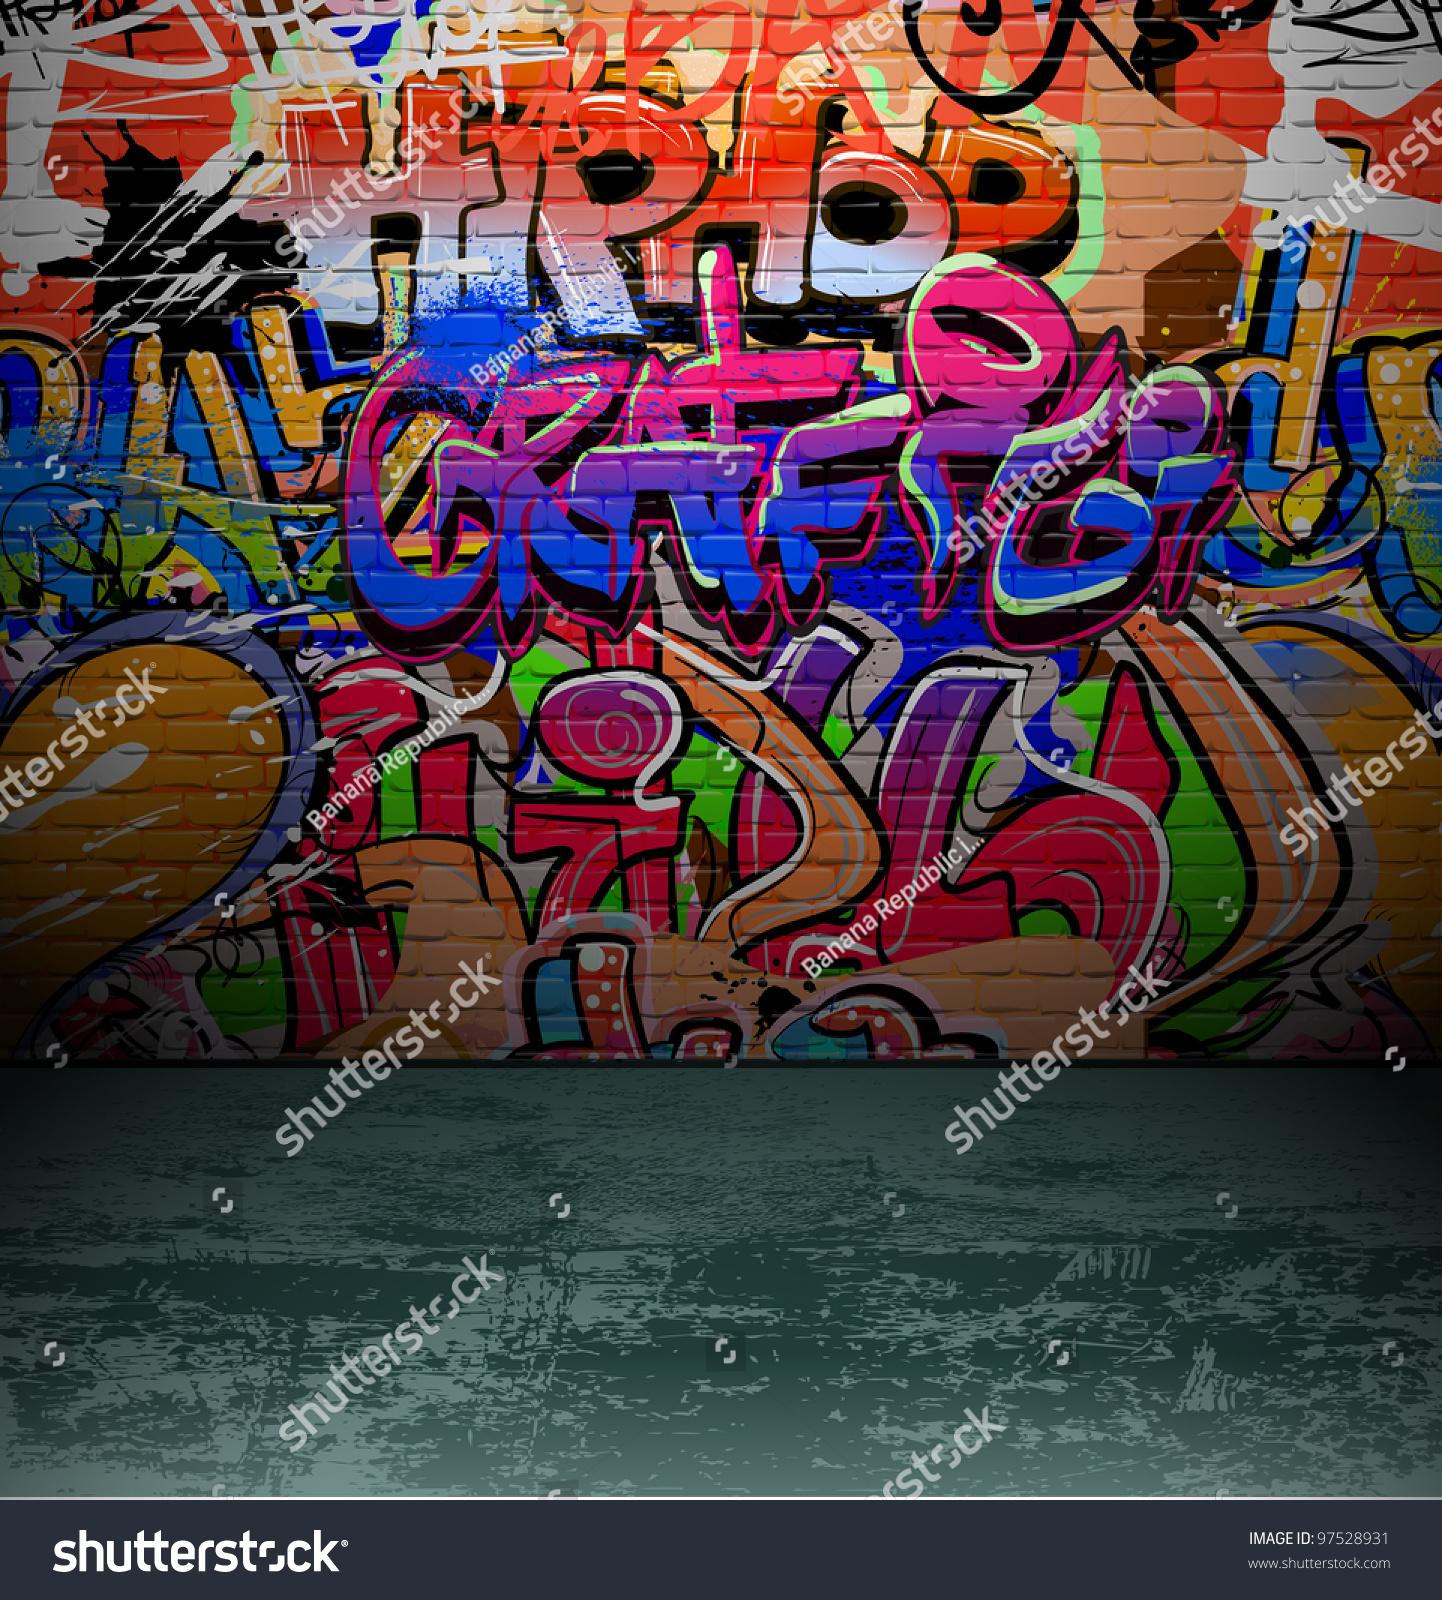 Graffiti wall vector free - Graffiti Wall Background Urban Street Grunge Art Vector Design